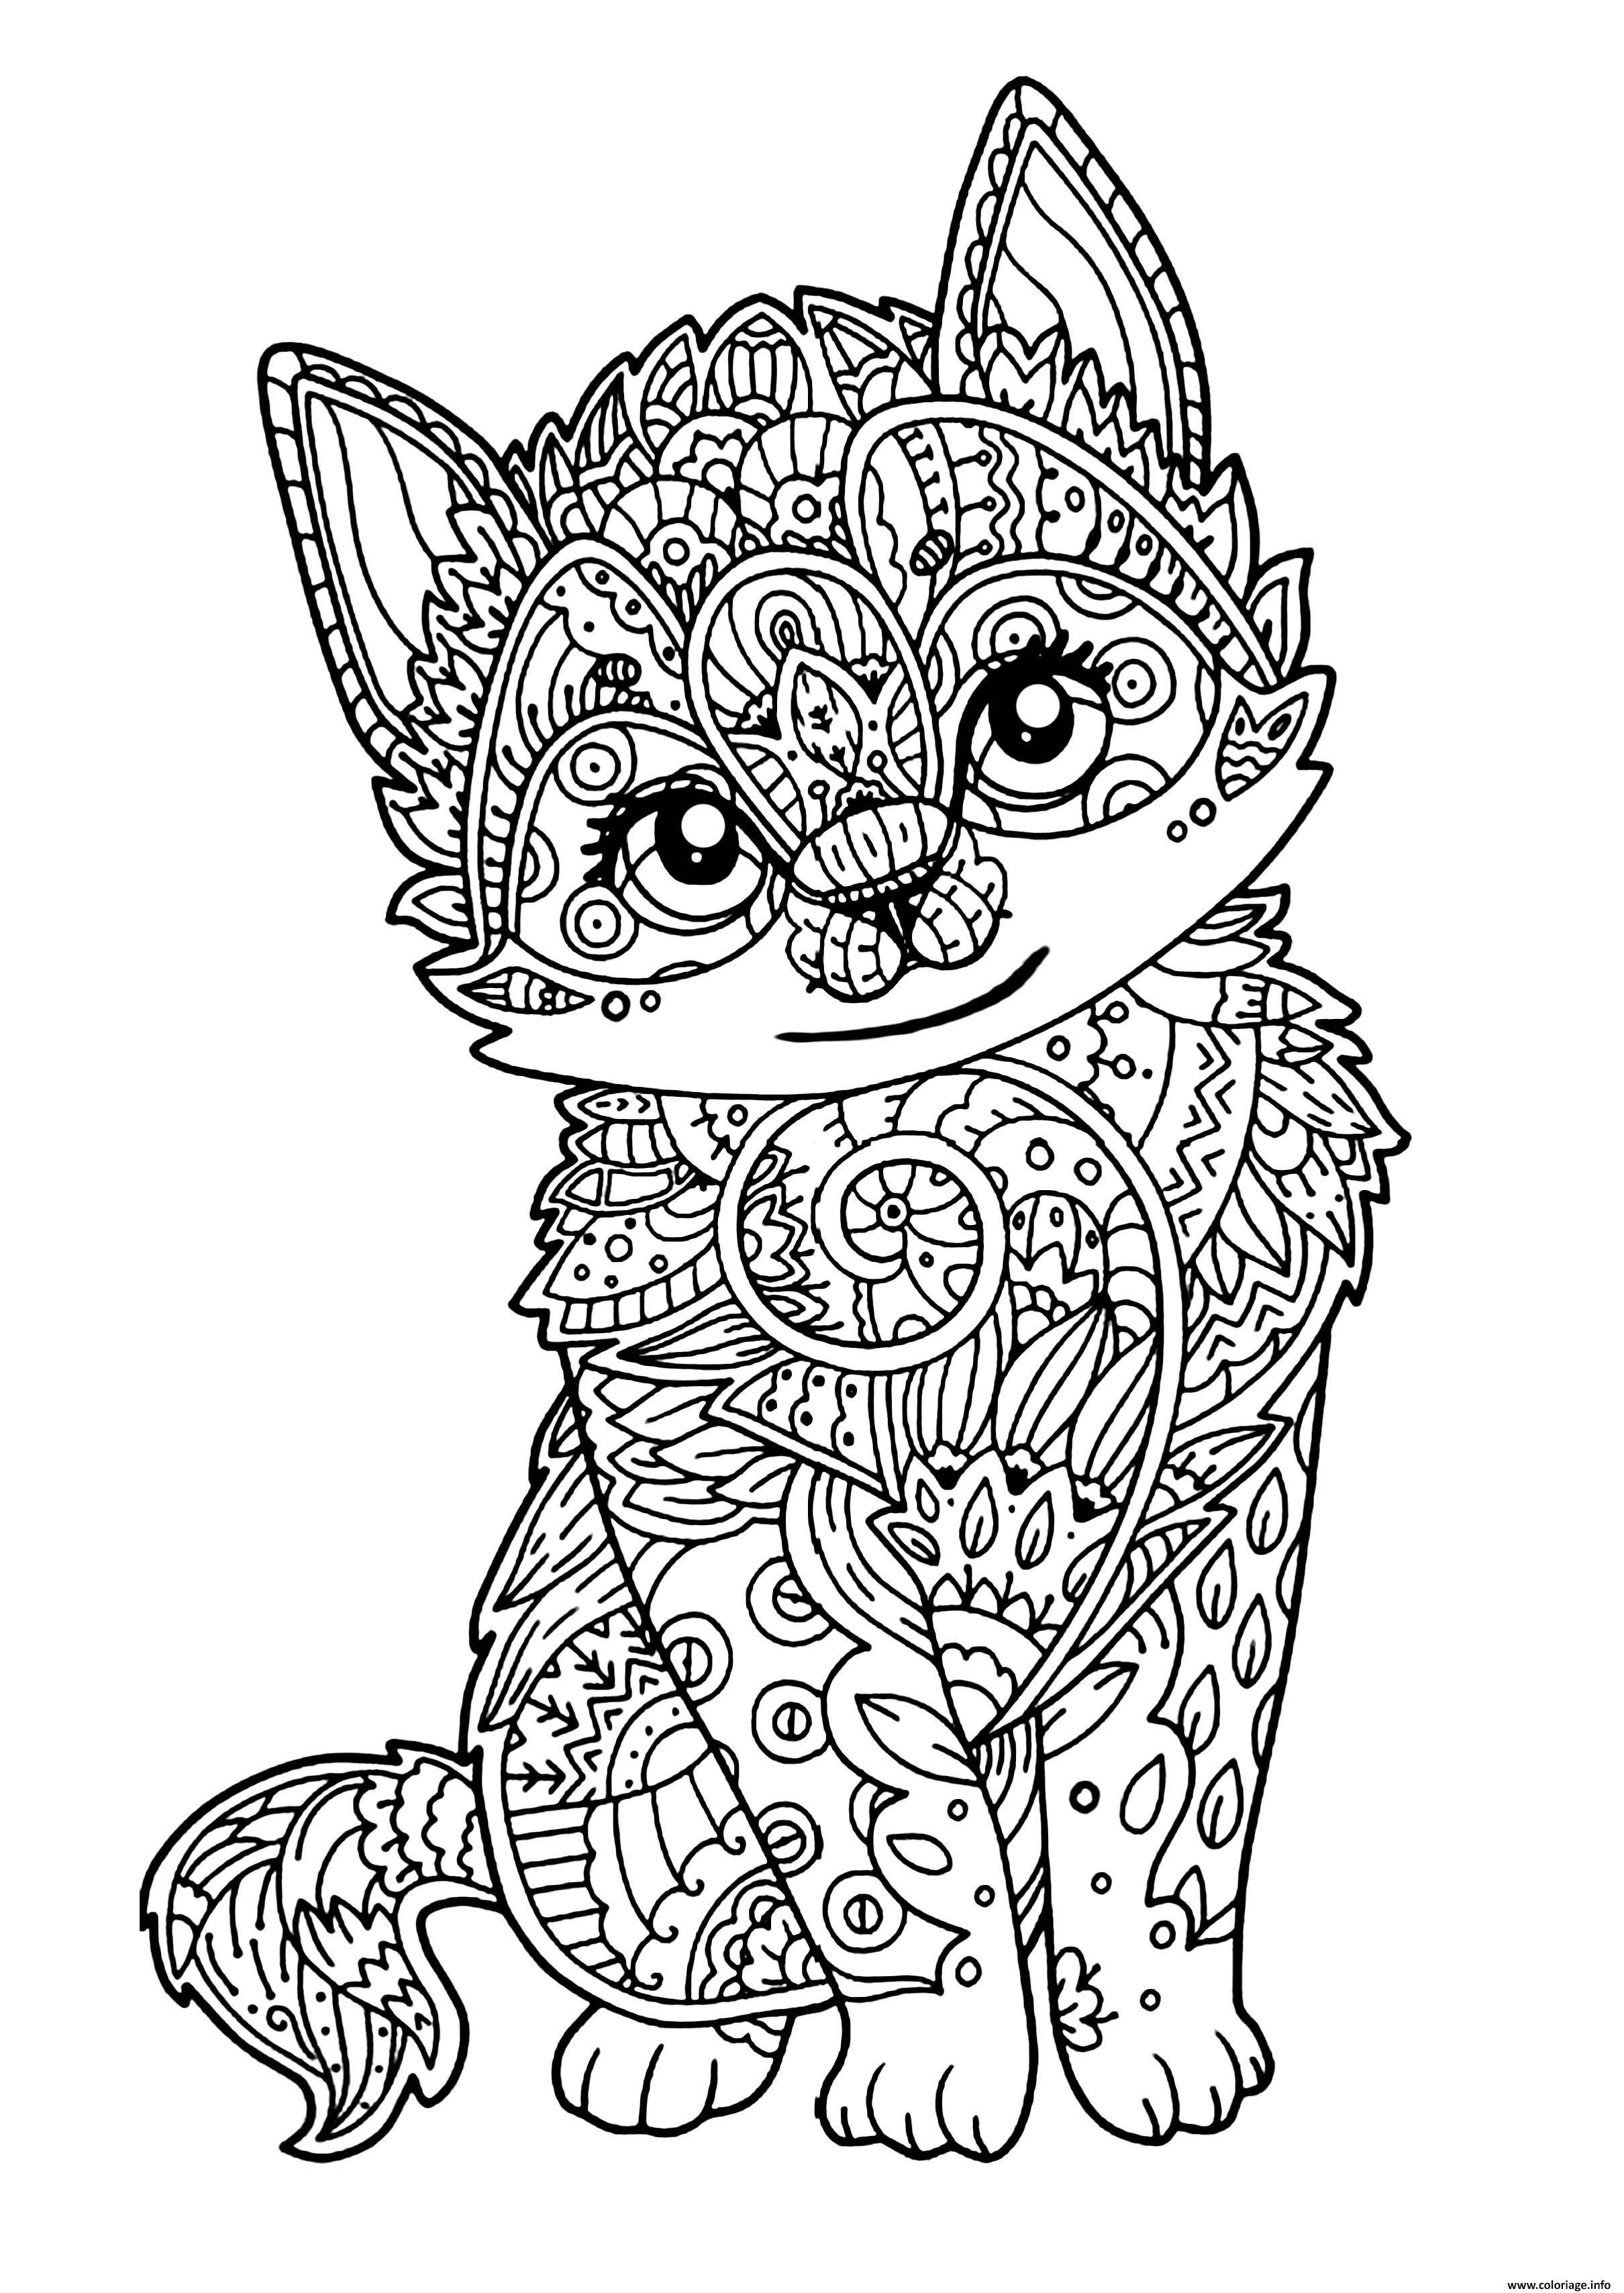 Dessin chat mignon chaton adulte Coloriage Gratuit  Imprimer